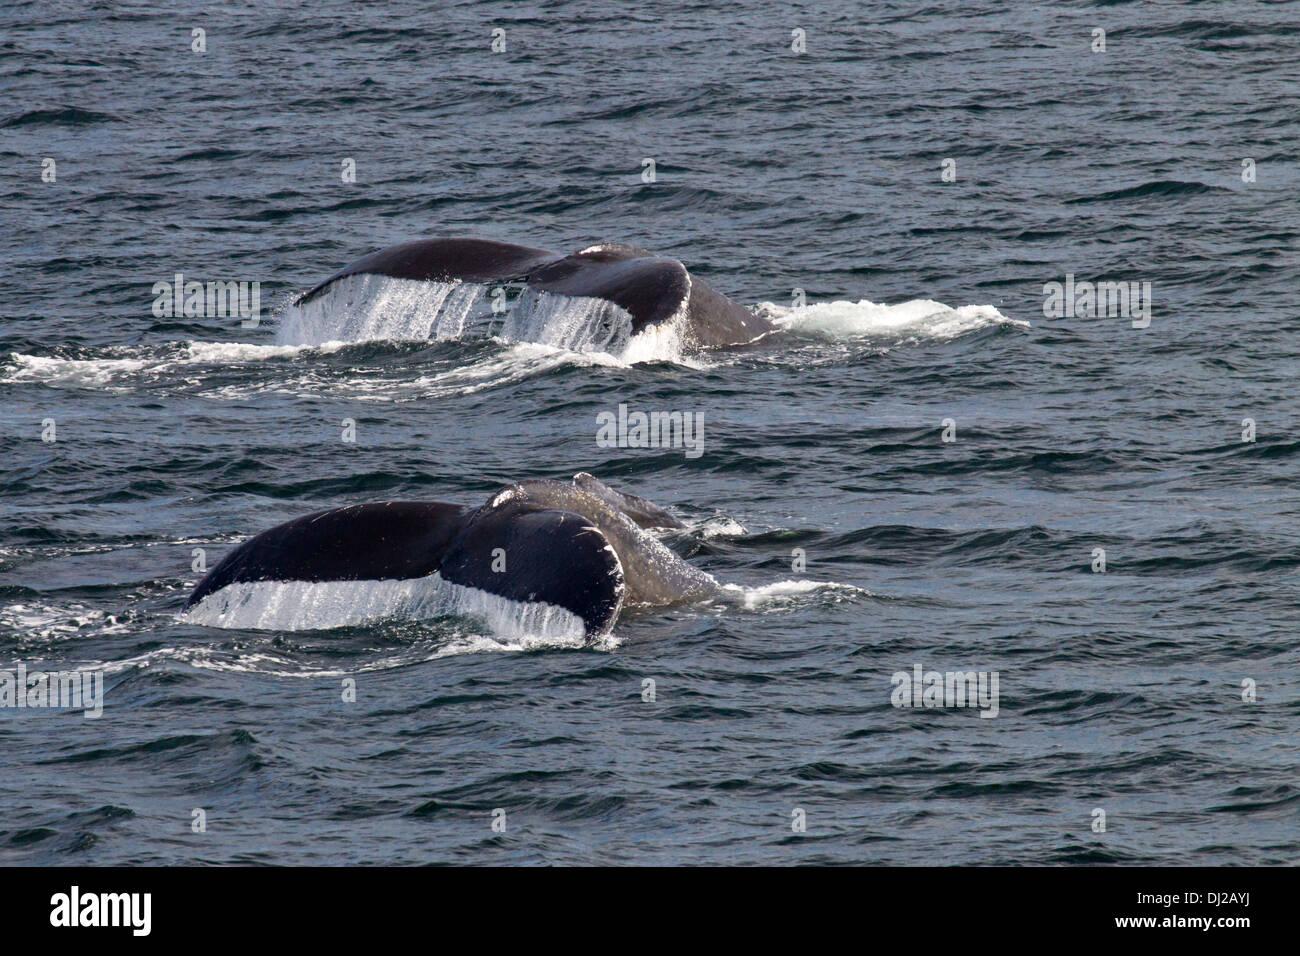 Pair of Humpback Whales (Megaptera novaeangliae) Diving simultanoeusly - Stock Image